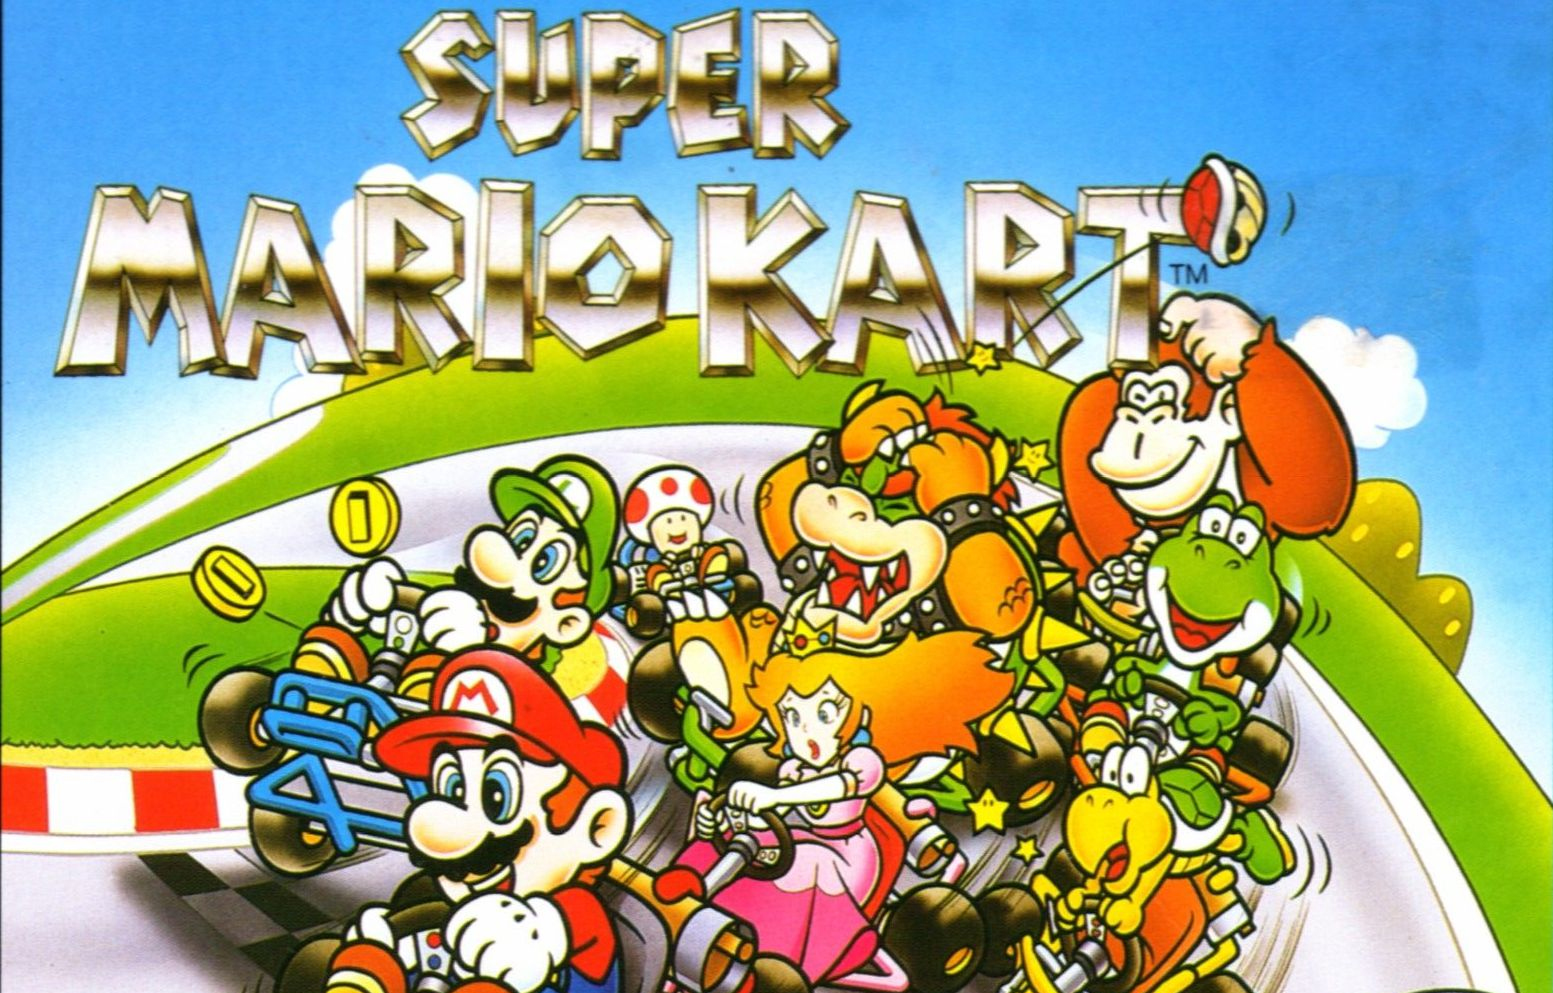 The Complete History Of Mario Kart Venturebeat